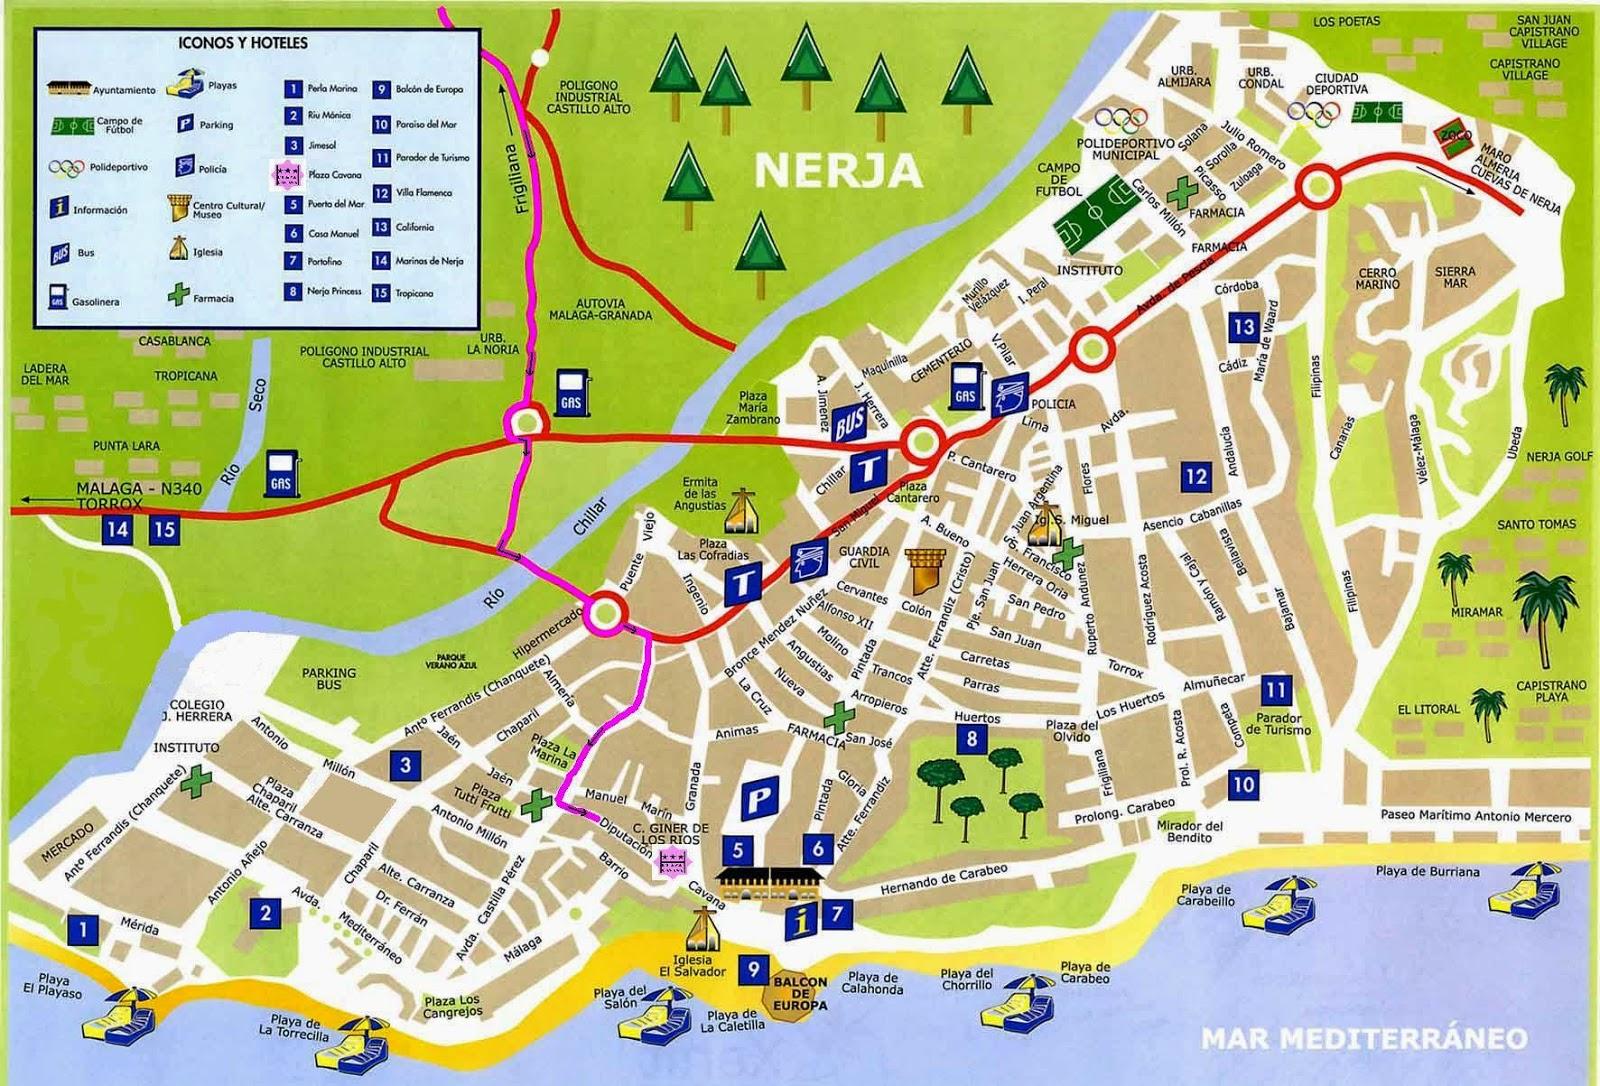 Nerja e la costa del sol orientale ramingo dentro for Oficina de turismo nerja